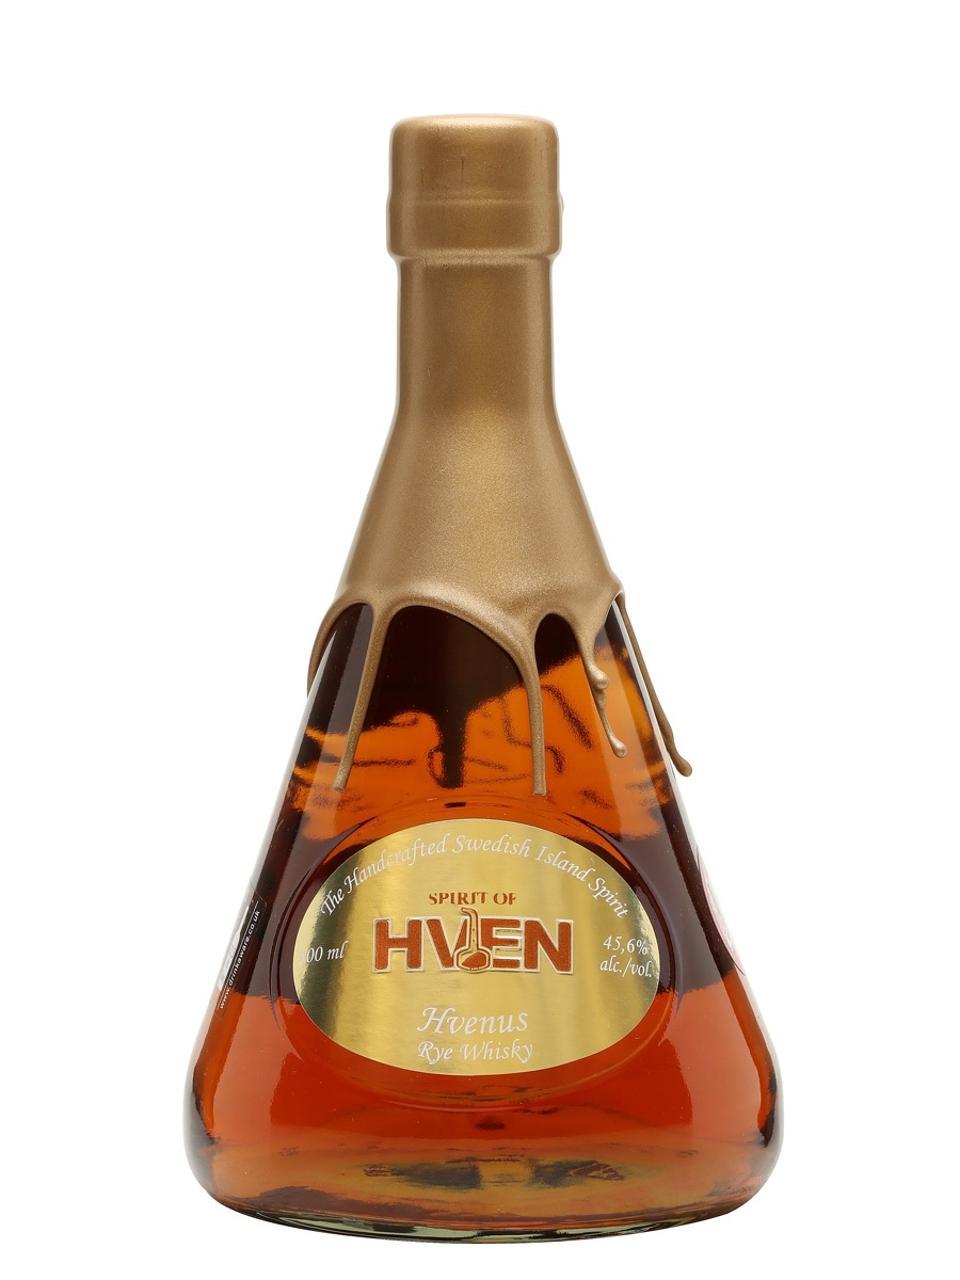 Spirit of Hven, Hvenus Rye Whisky